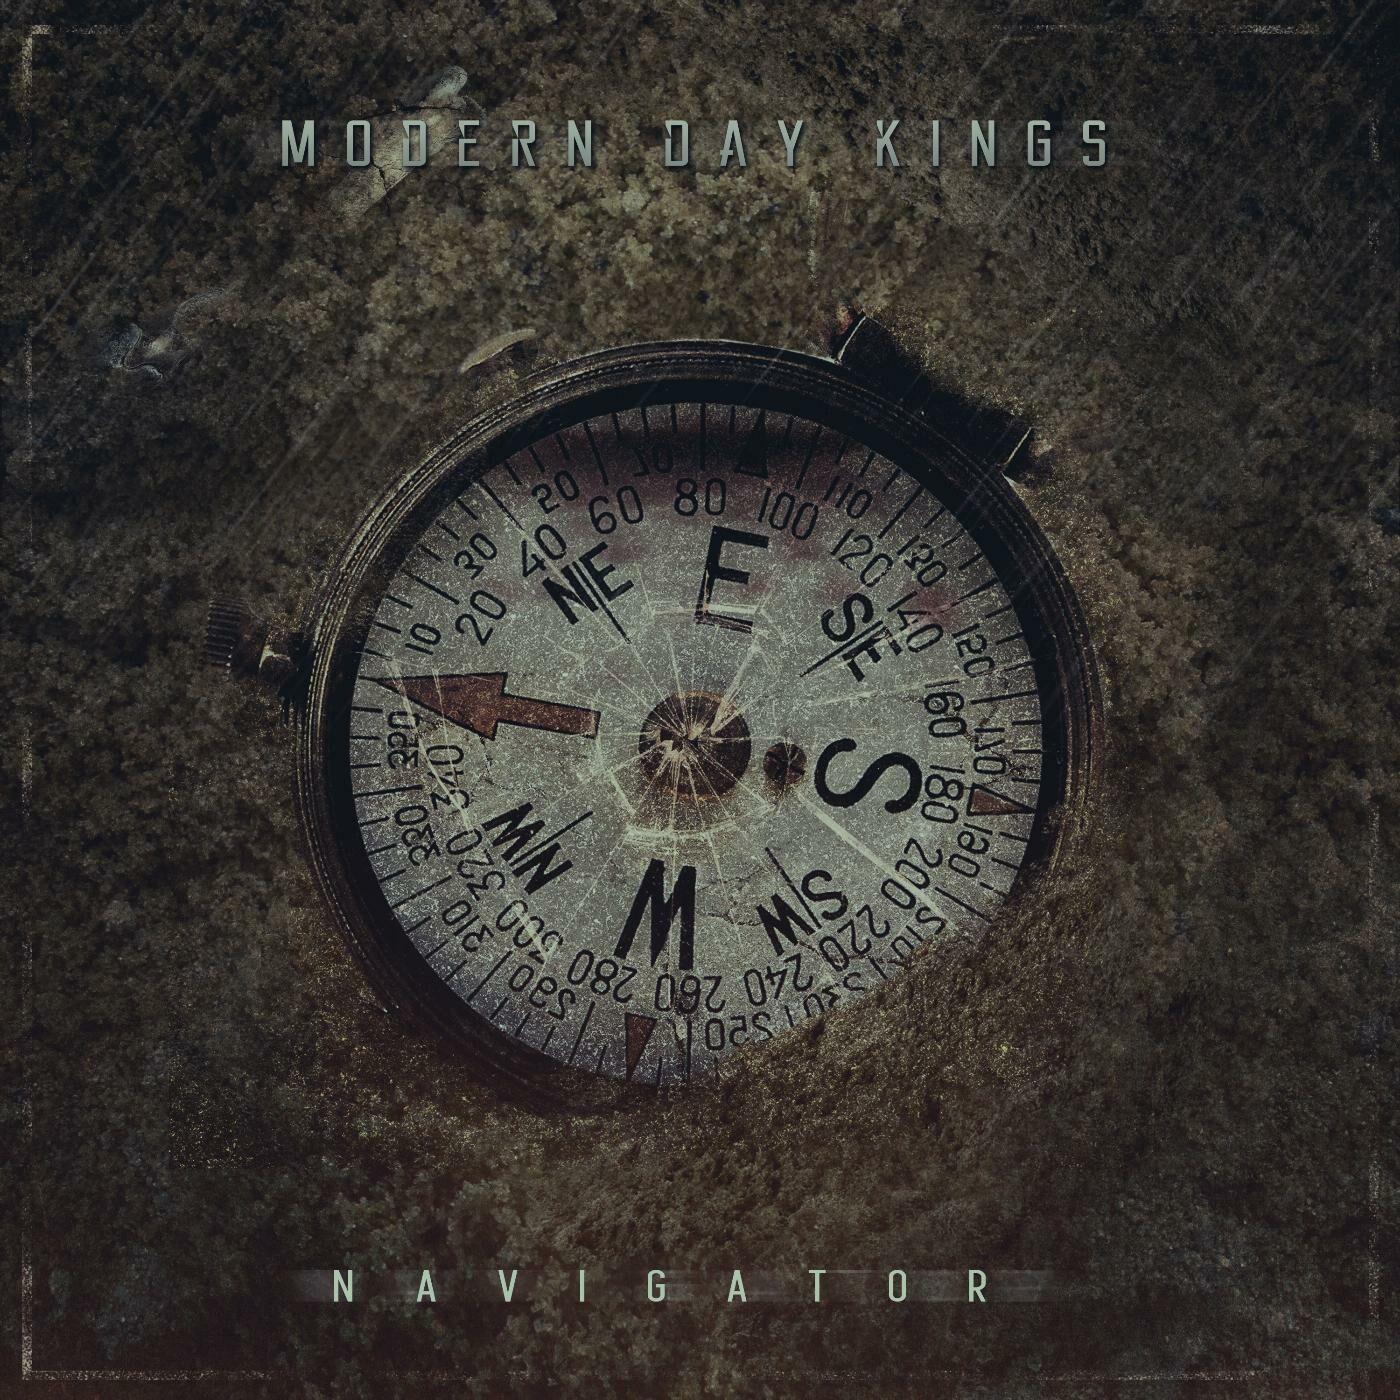 Modern Day Kings - Navigator [EP] (2016)